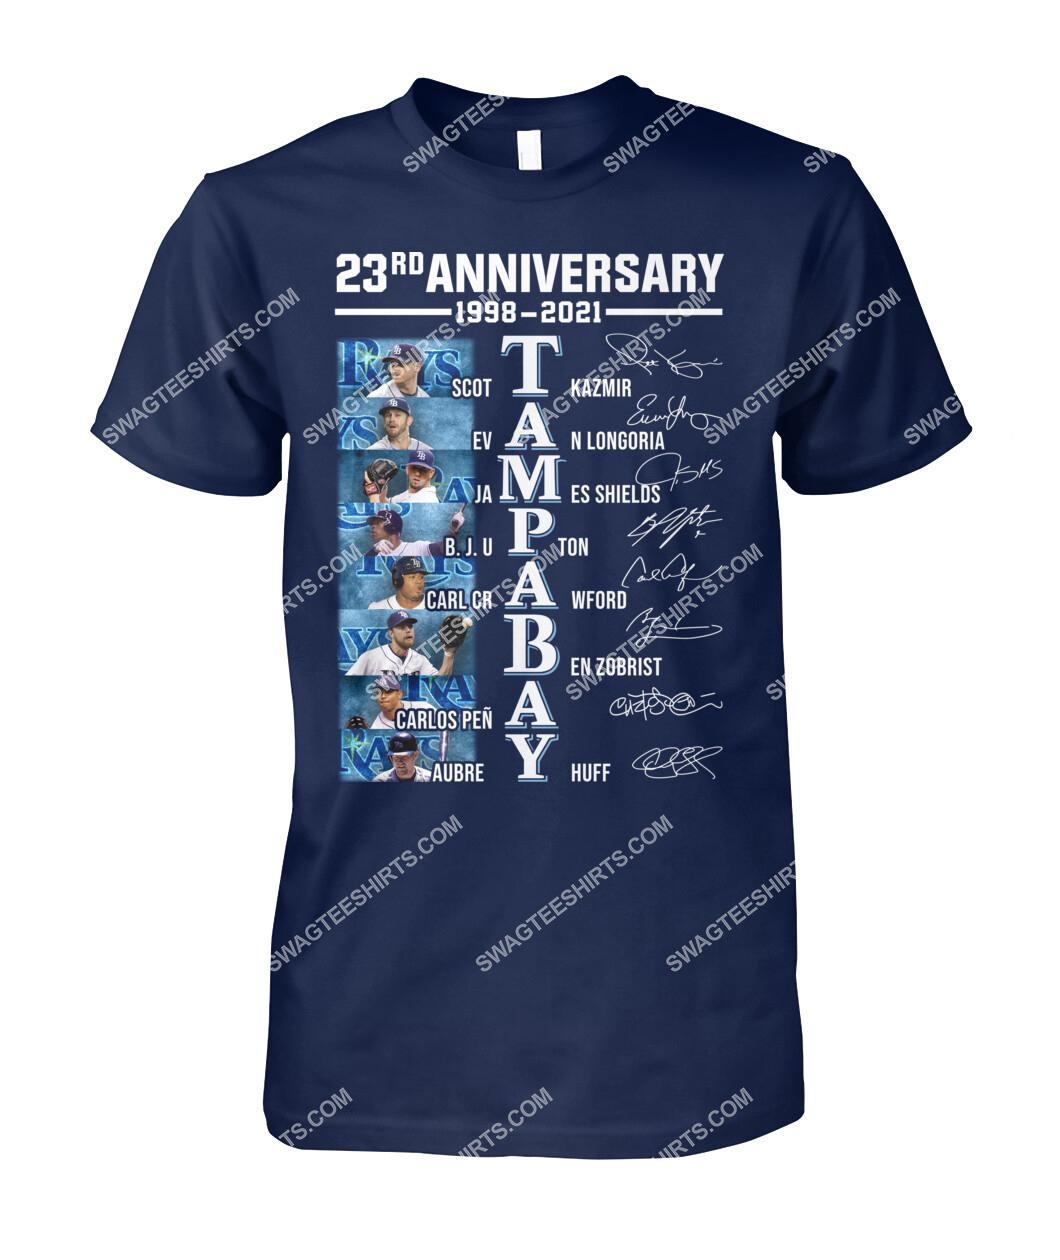 the tampa bay rays 23rd anniversary 1998 2021 signatures mlb tshirt 1